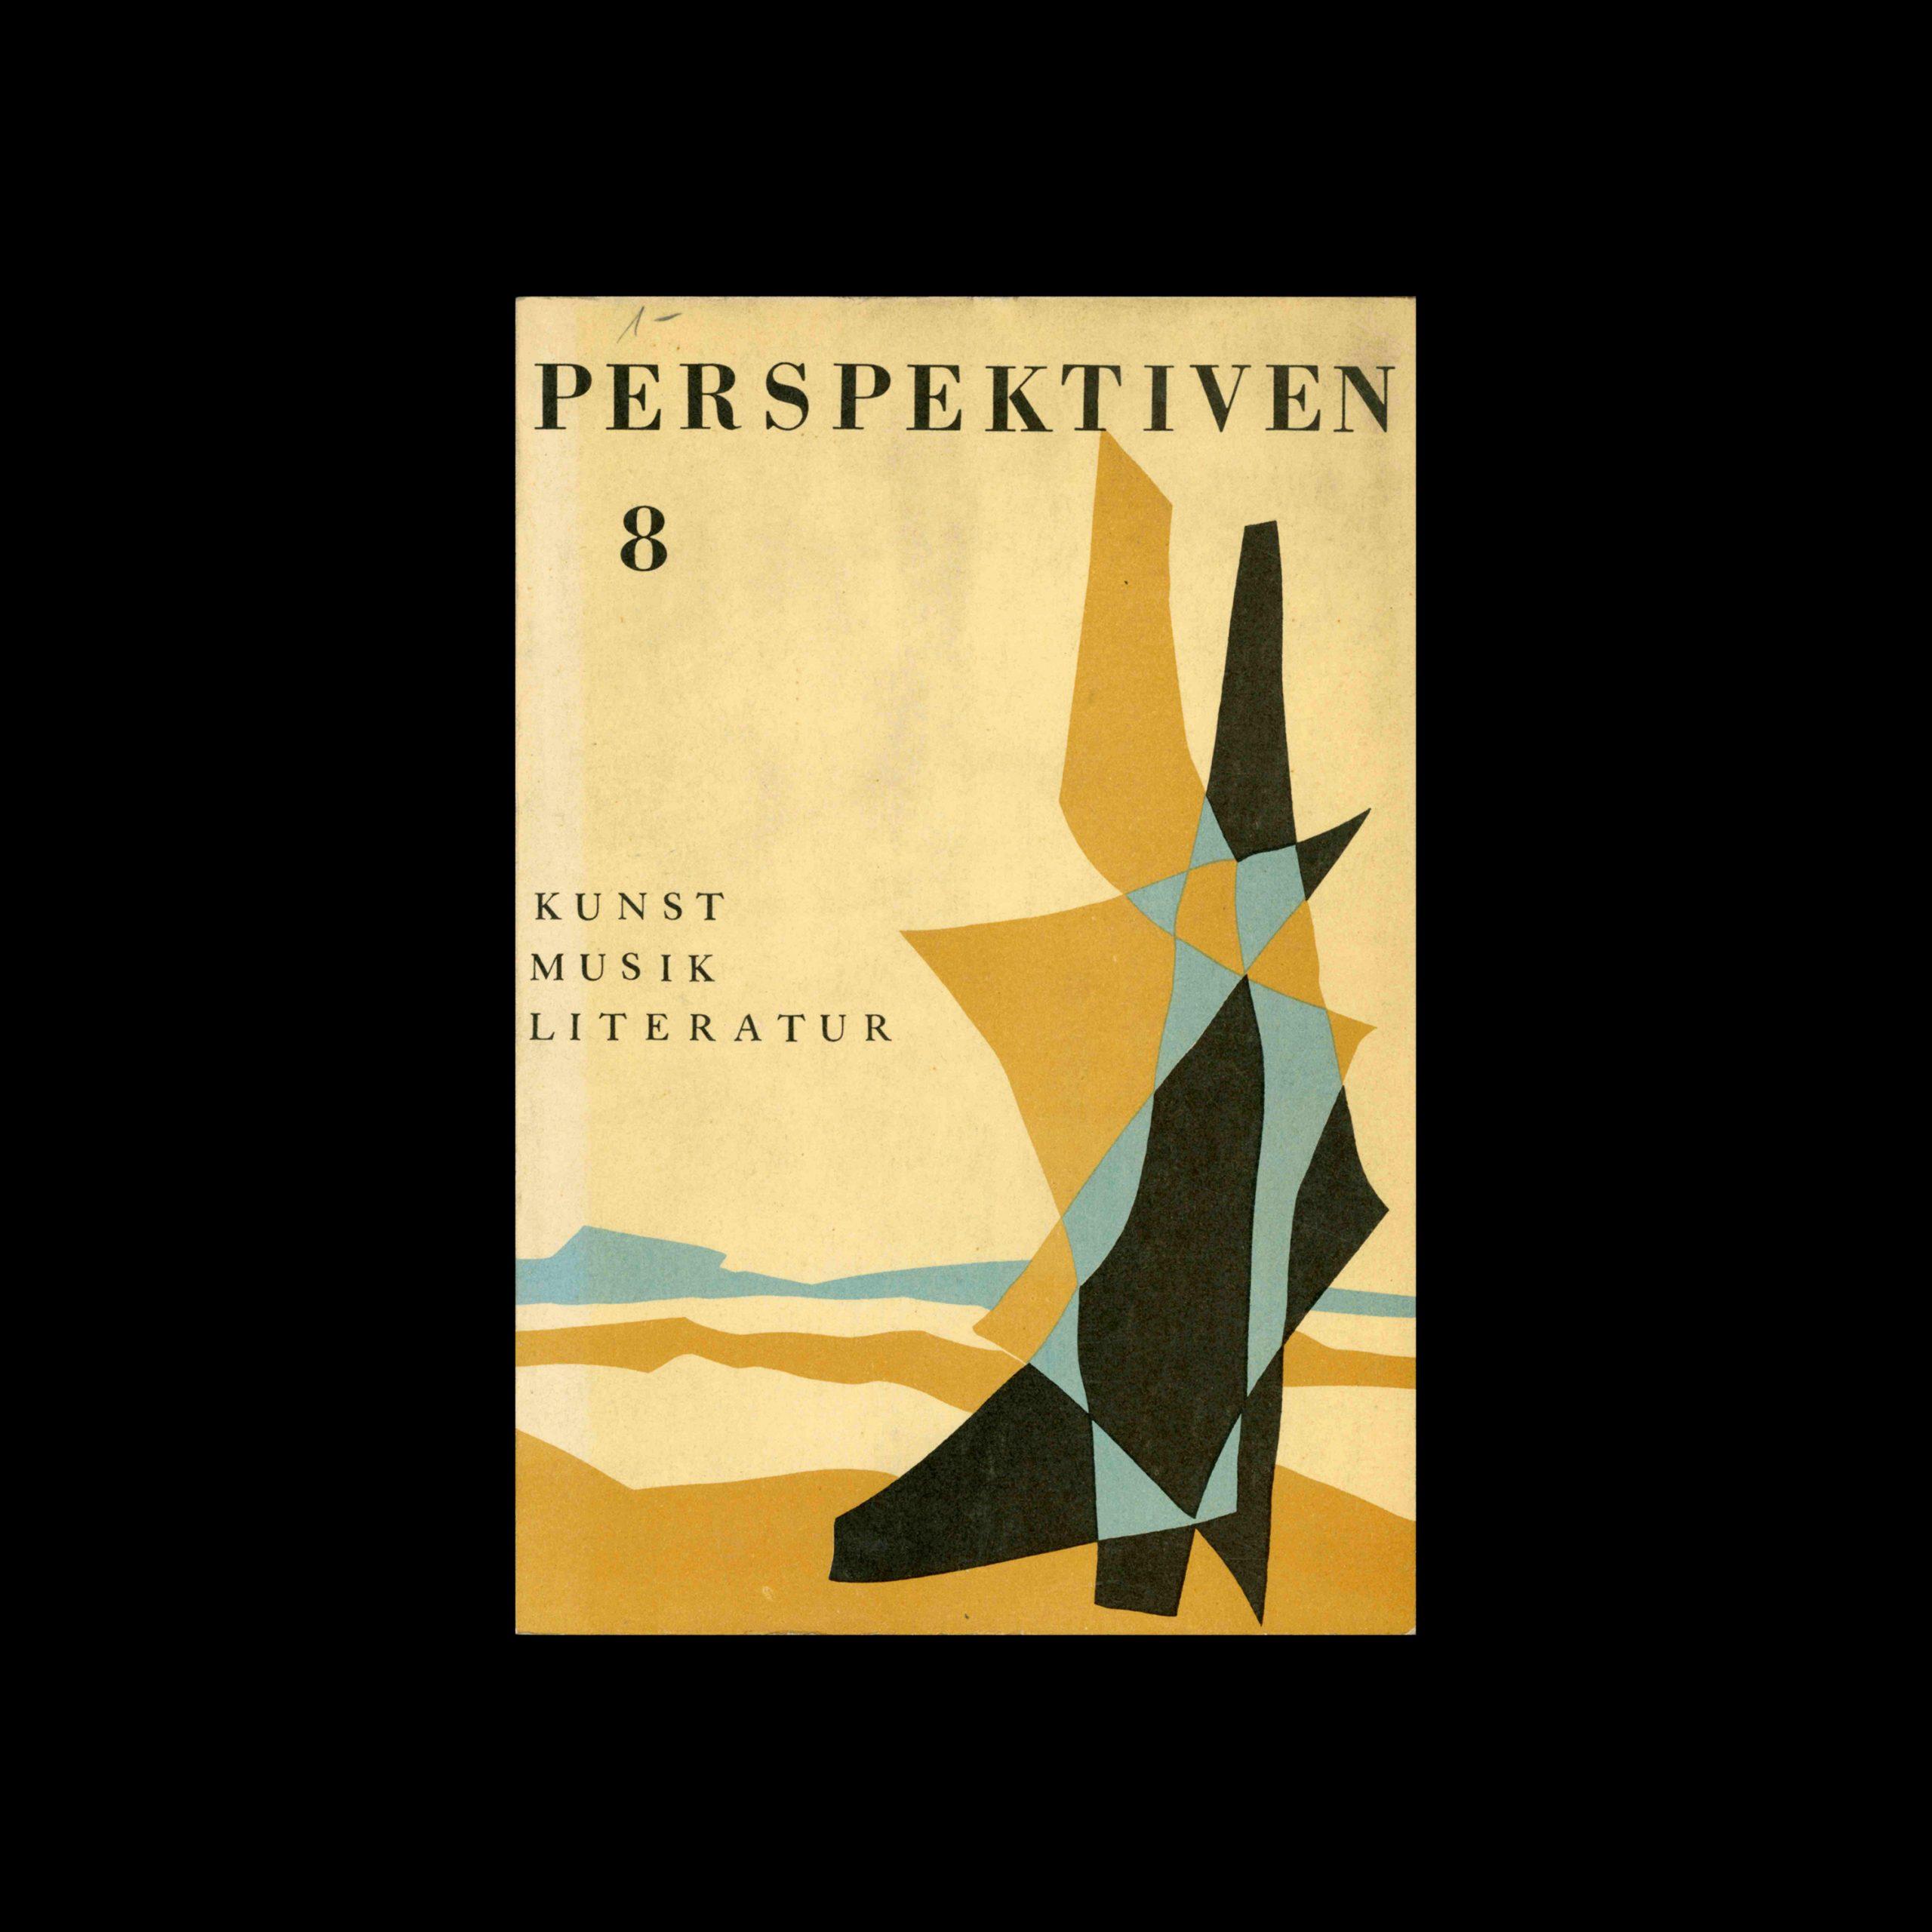 Perspektiven, Literatur, Kunst, Musik, 8, 1954. Cover design by Clemens L. Mirmont